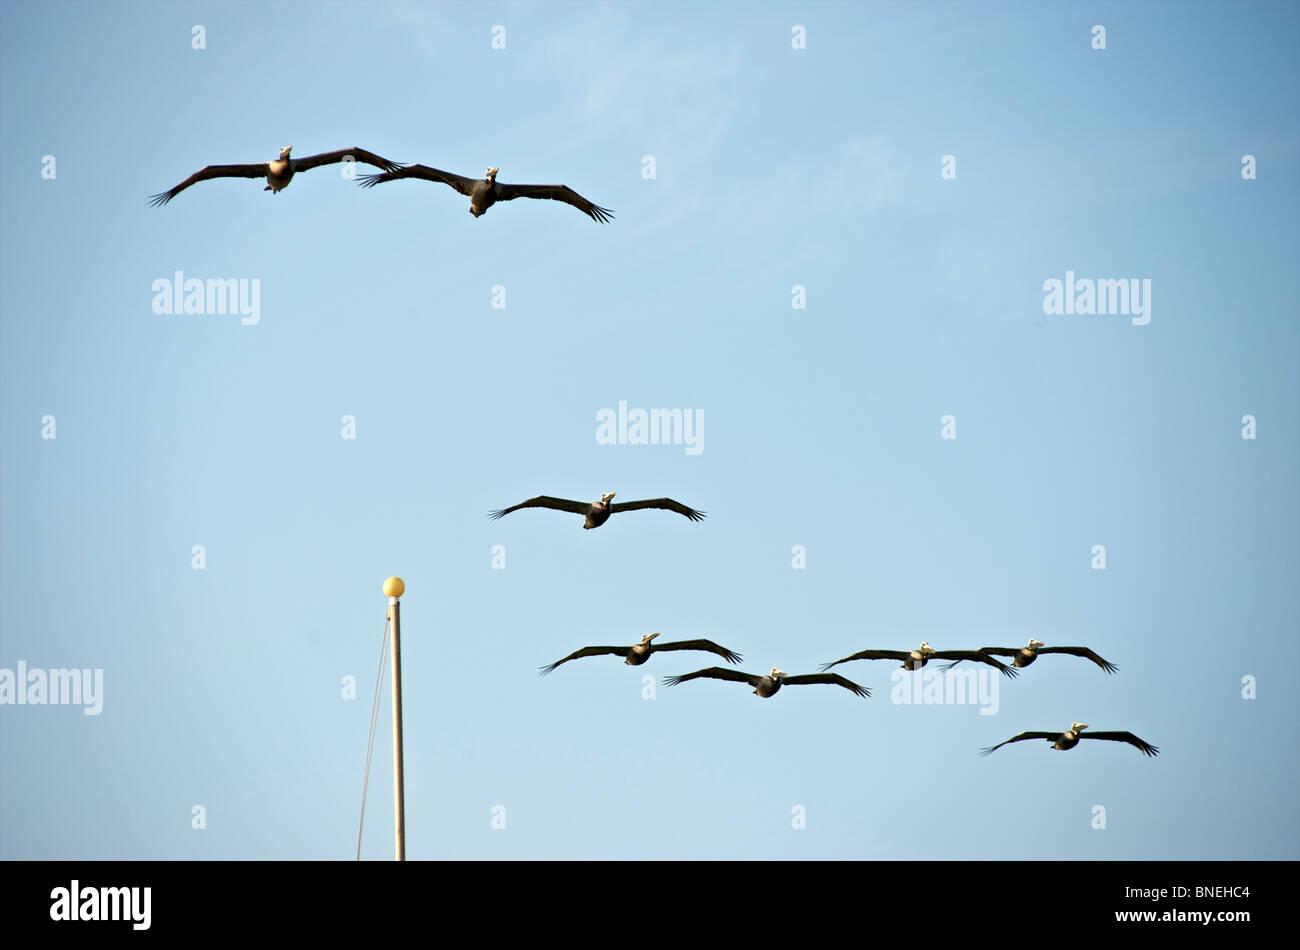 La formation en vol Pelican Galveston, Texas, en Amérique du Nord, Etats-Unis Banque D'Images